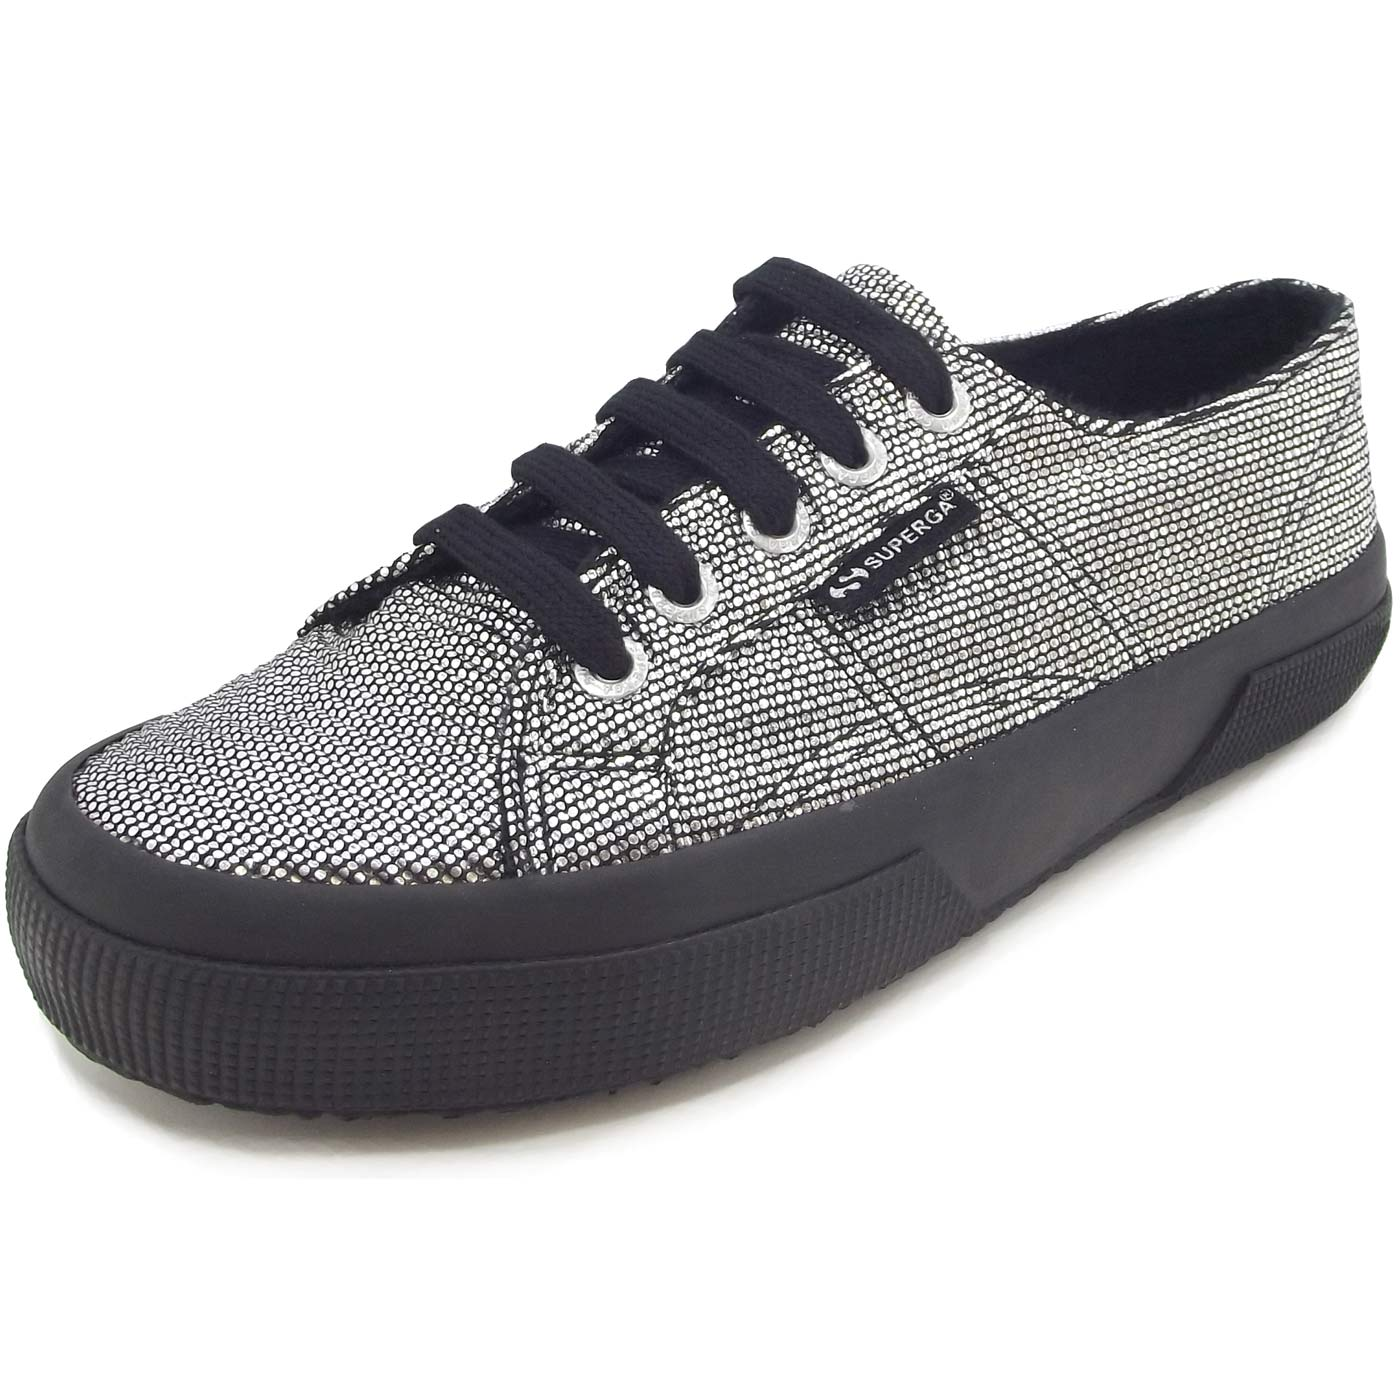 Superga 2750 Plisselamew Women Sneakers